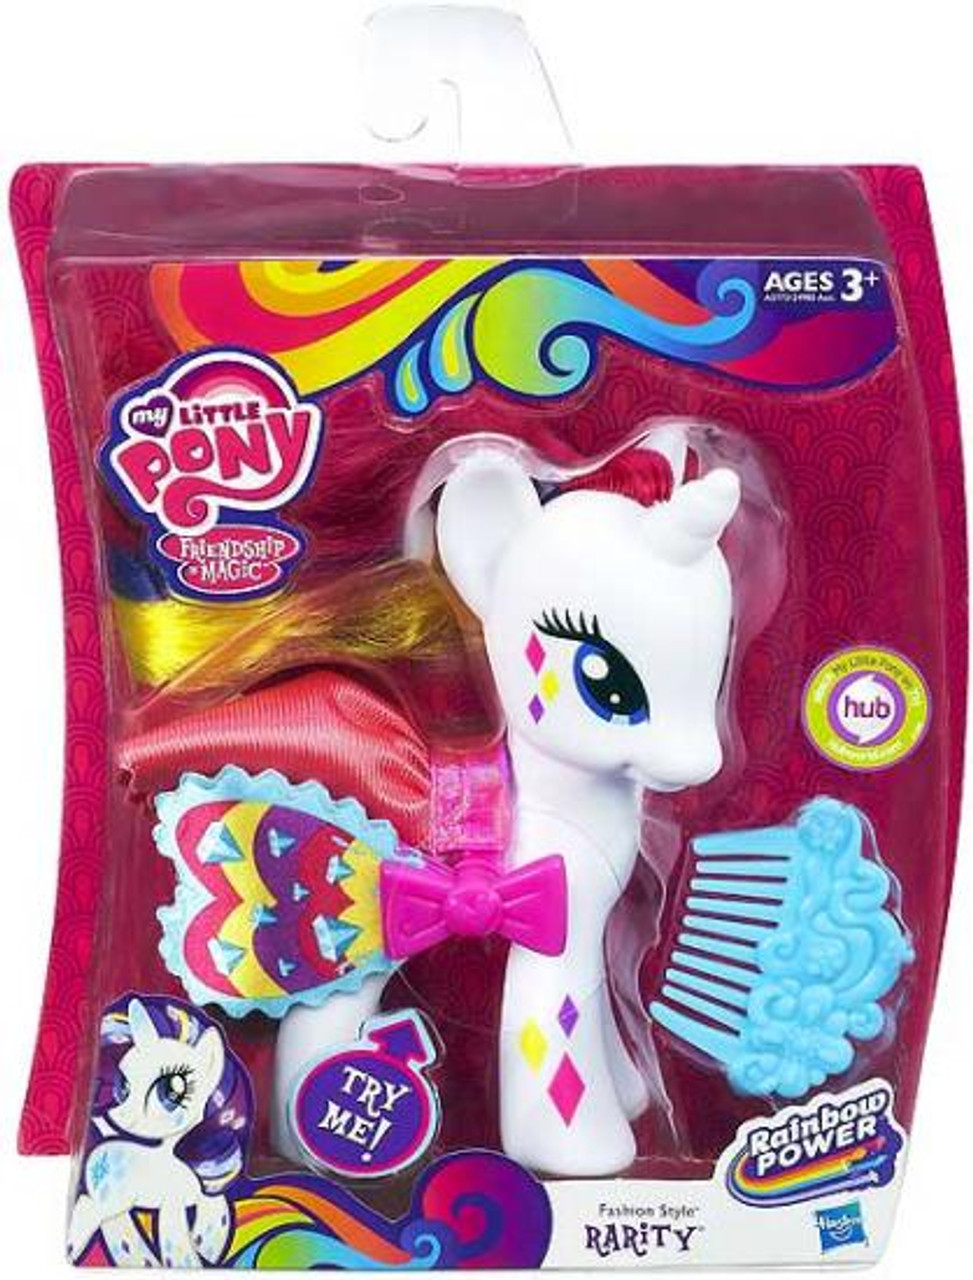 My Little Pony Friendship is Magic Rainbow Power Fashion Style Rarity Figure